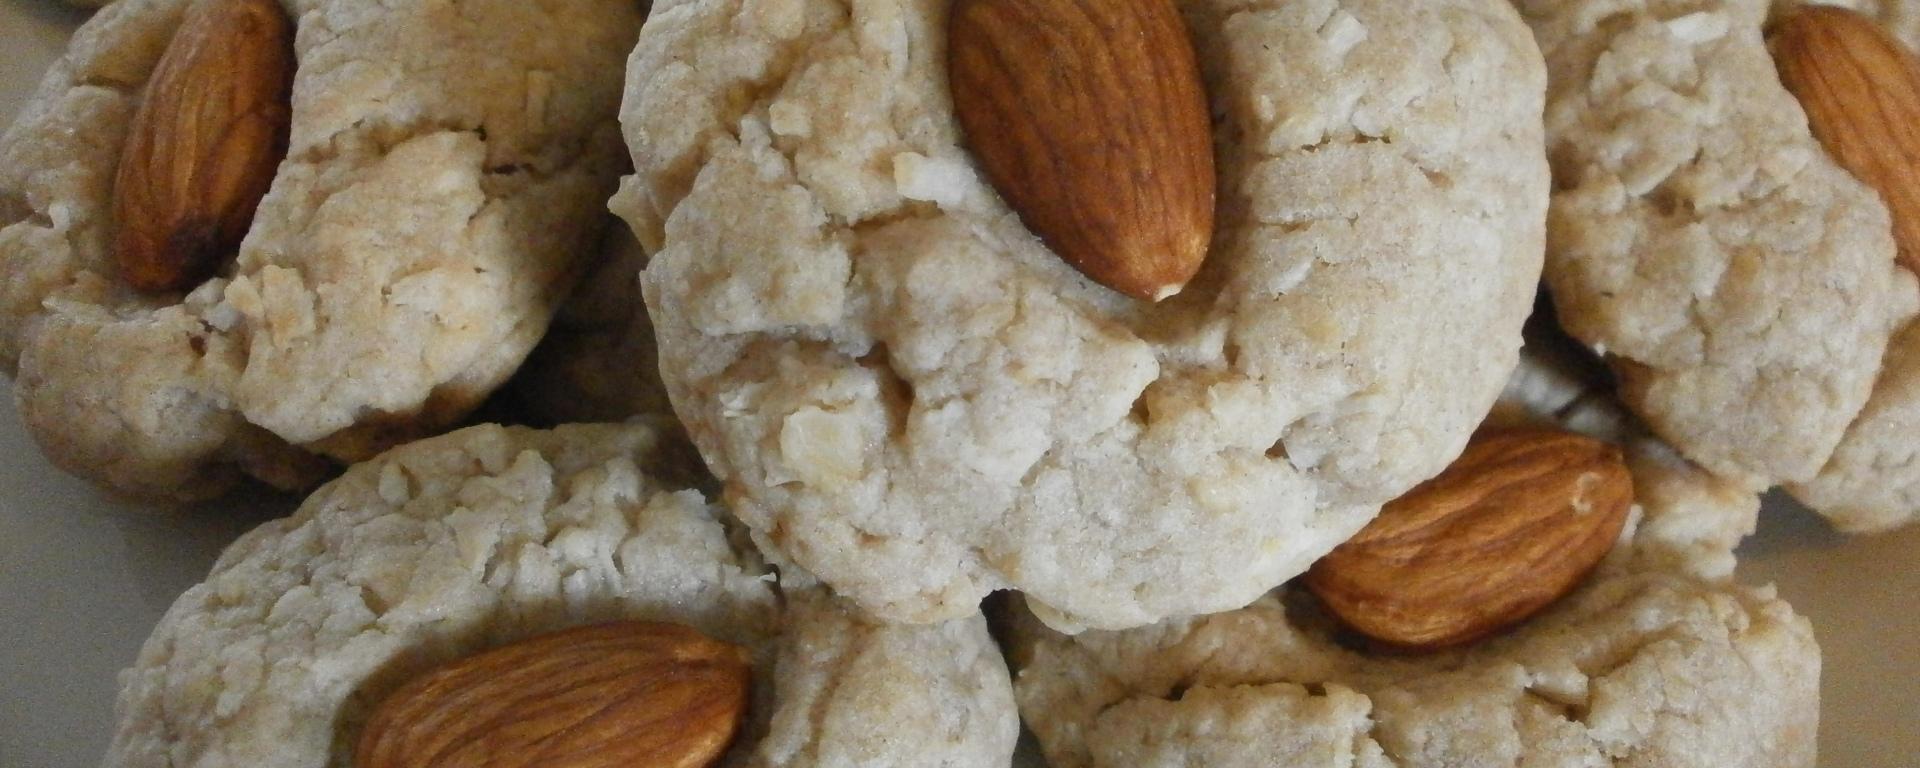 Almond-kissed butter pecan cookies